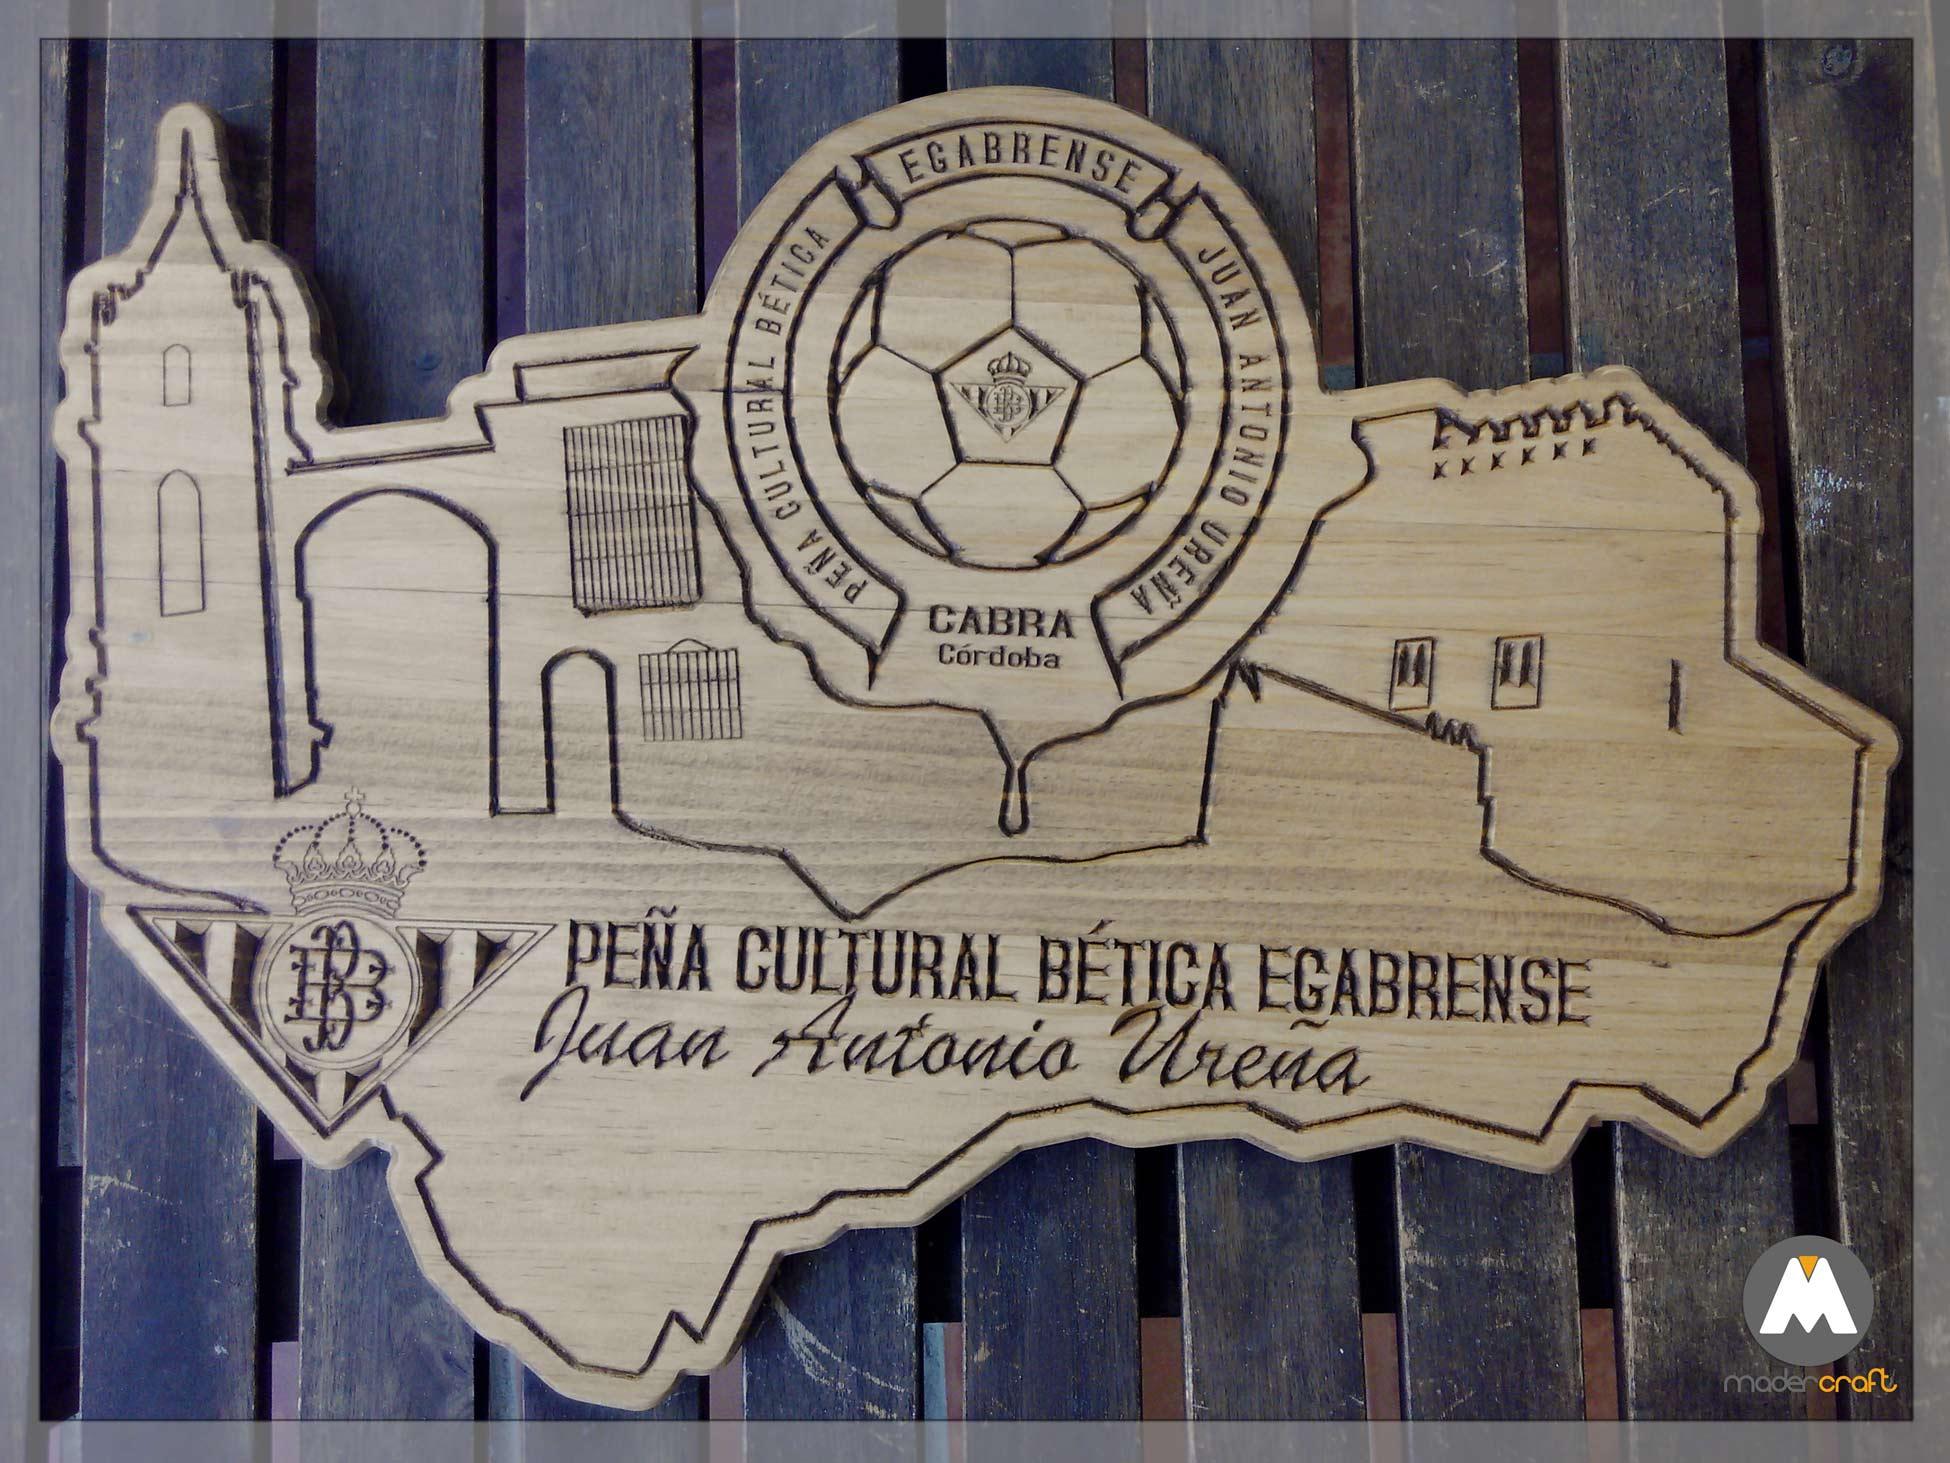 Placa Madera Deportiva Bética Peña Cultural Egabrense Juan Antonio Ureña. Cabra Córdoba Andalucía. Agradecimiento Homenaje Fútbol Balompié. Madera pino. placa para colgar. Mapa Iglesia Castillo Balón escudo.